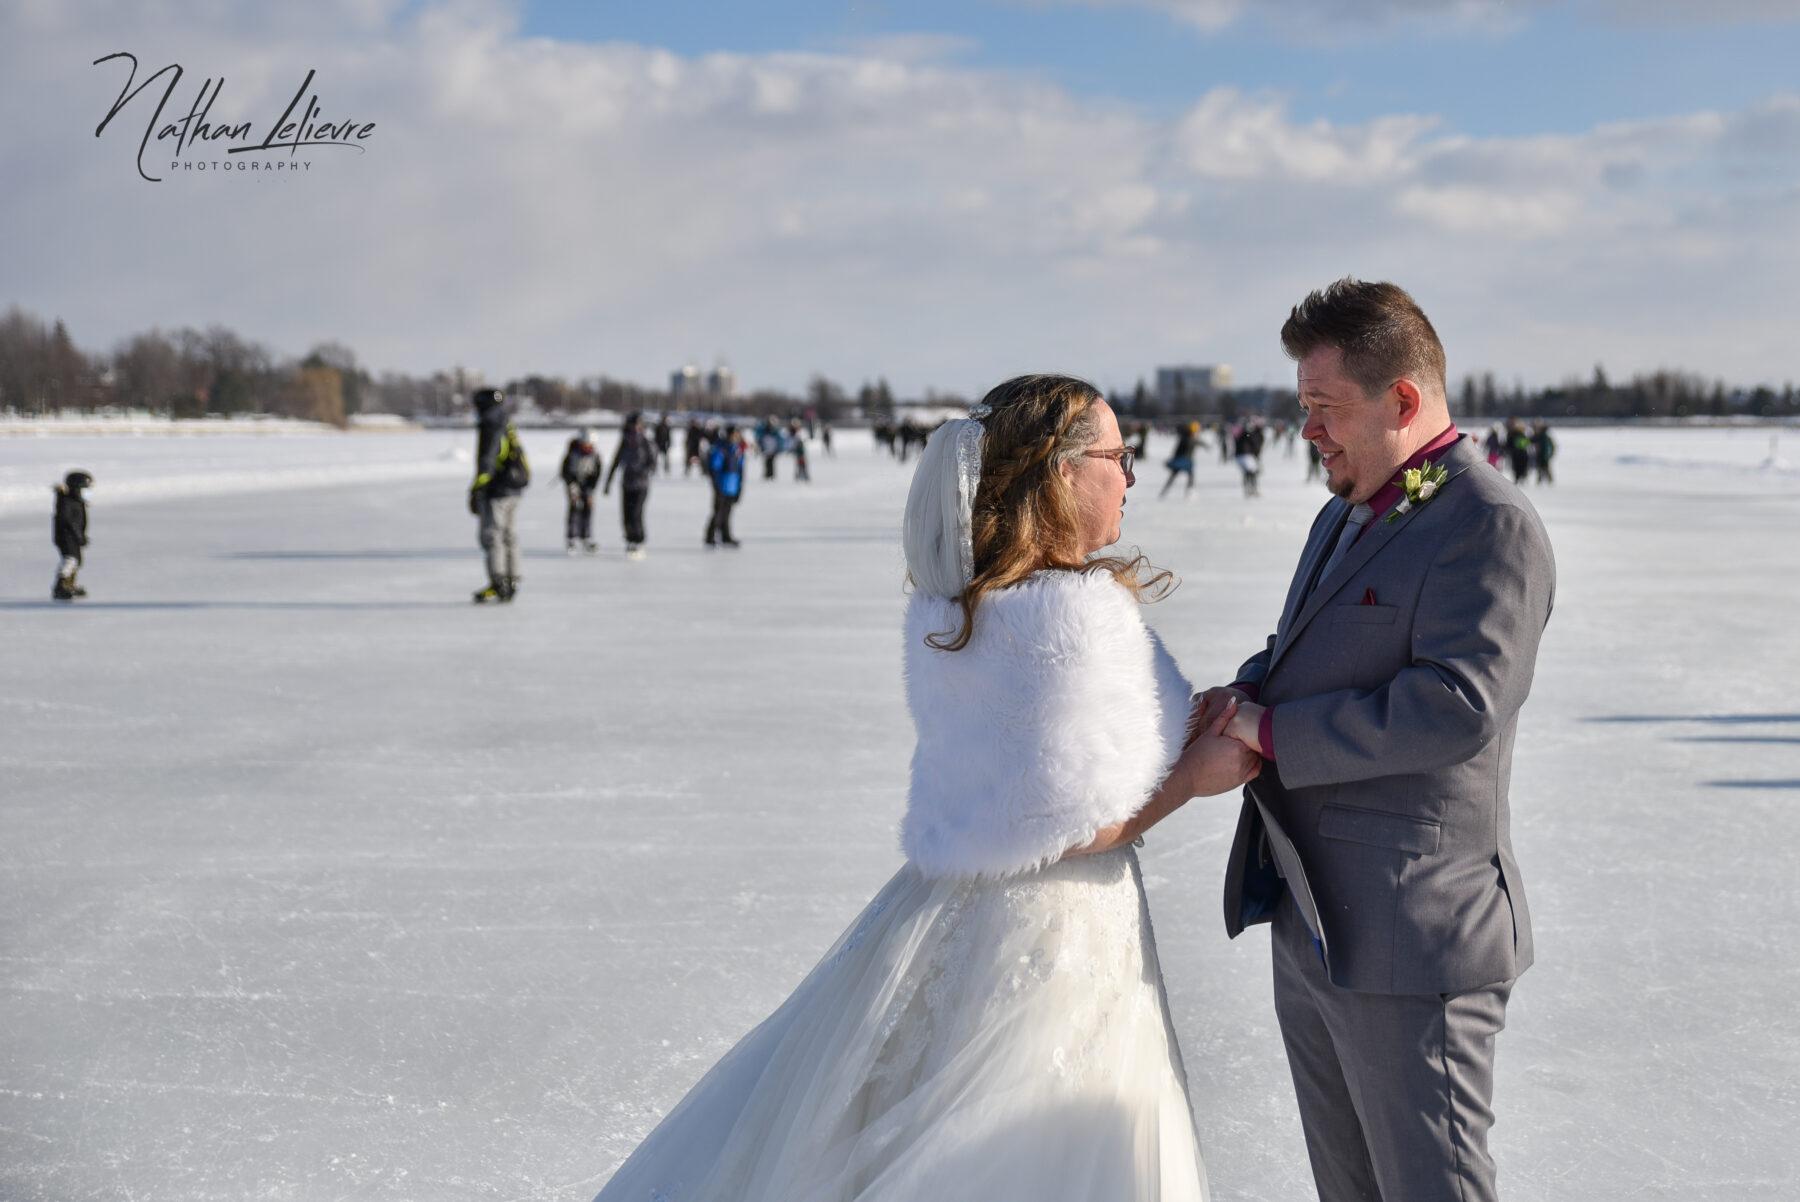 wedding outdoor ottawa winter